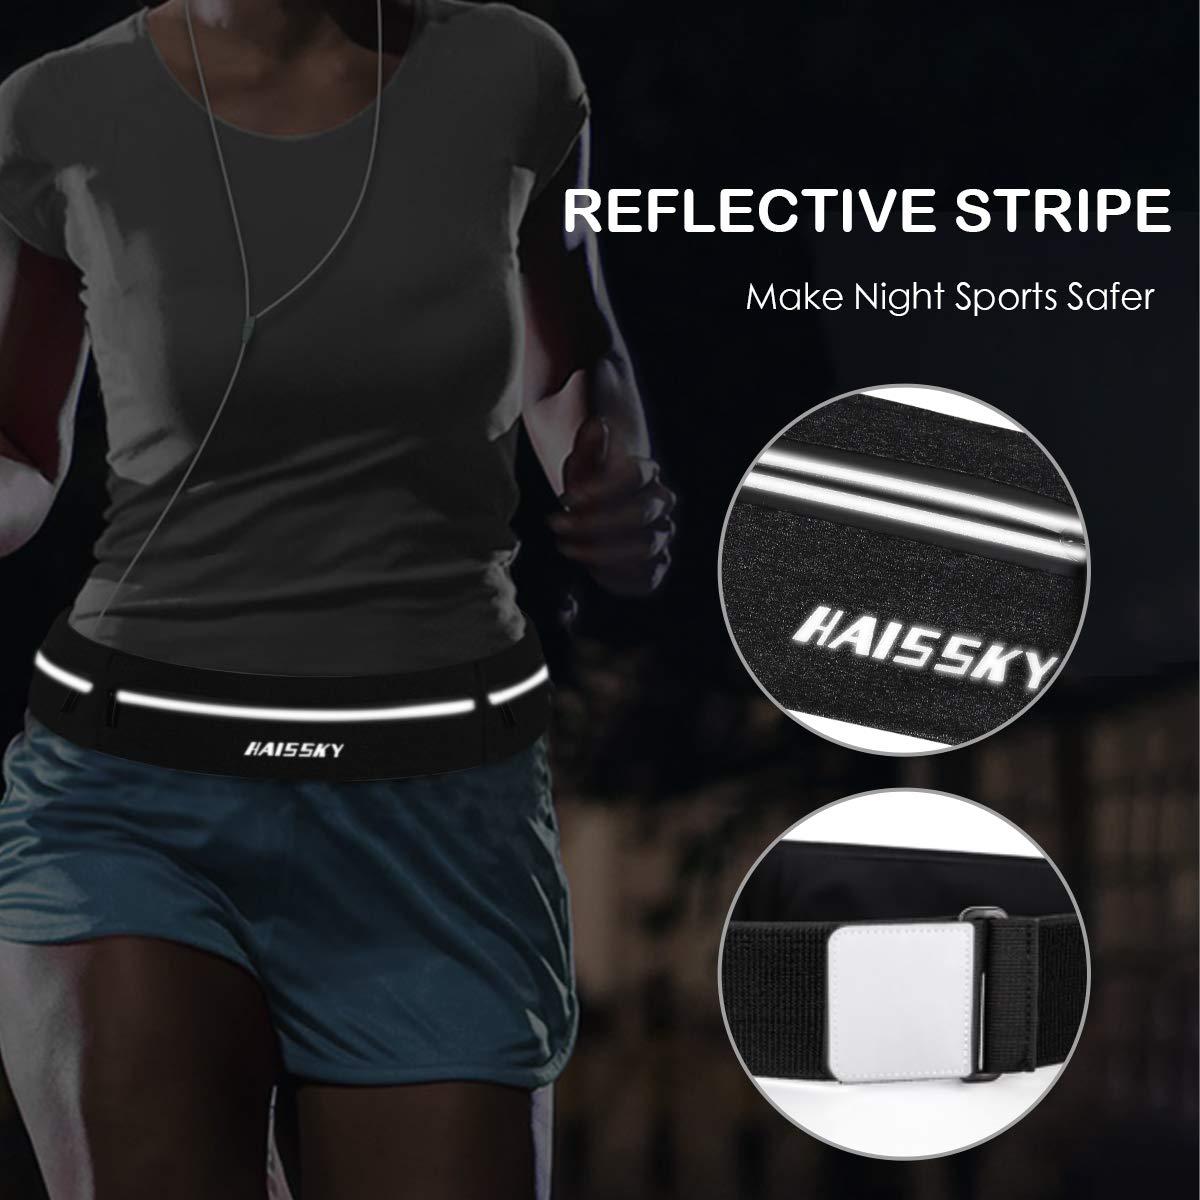 Orificio para Auricular. ORKNEY Ri/ñonera Deportiva Running Impermeable y Ligera Mujer Hombre con Bandas Refectantes